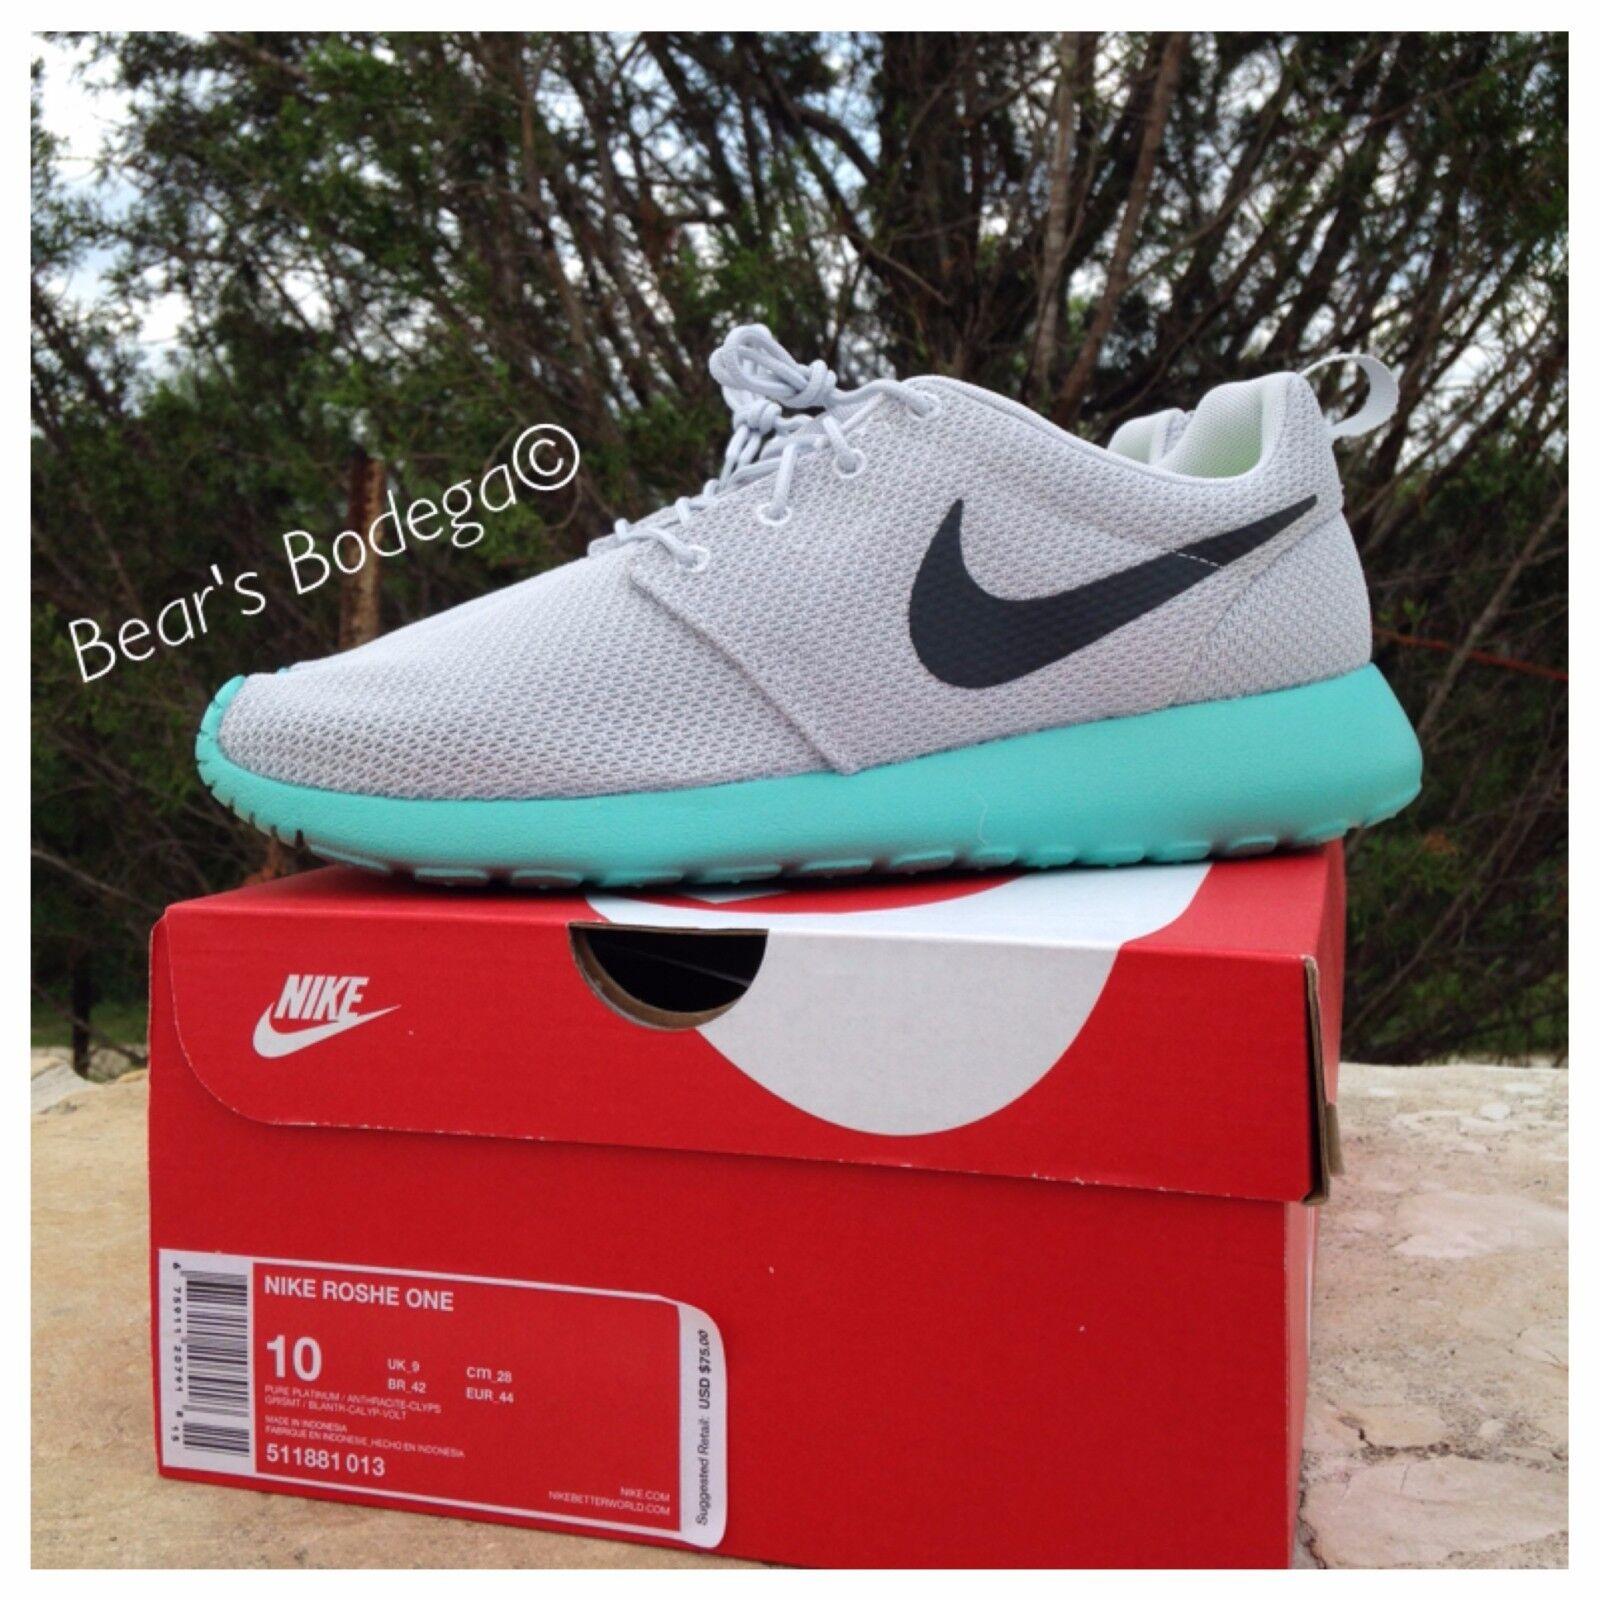 pretty nice af2a6 f24e4 Nike Roshe Roshe Roshe One